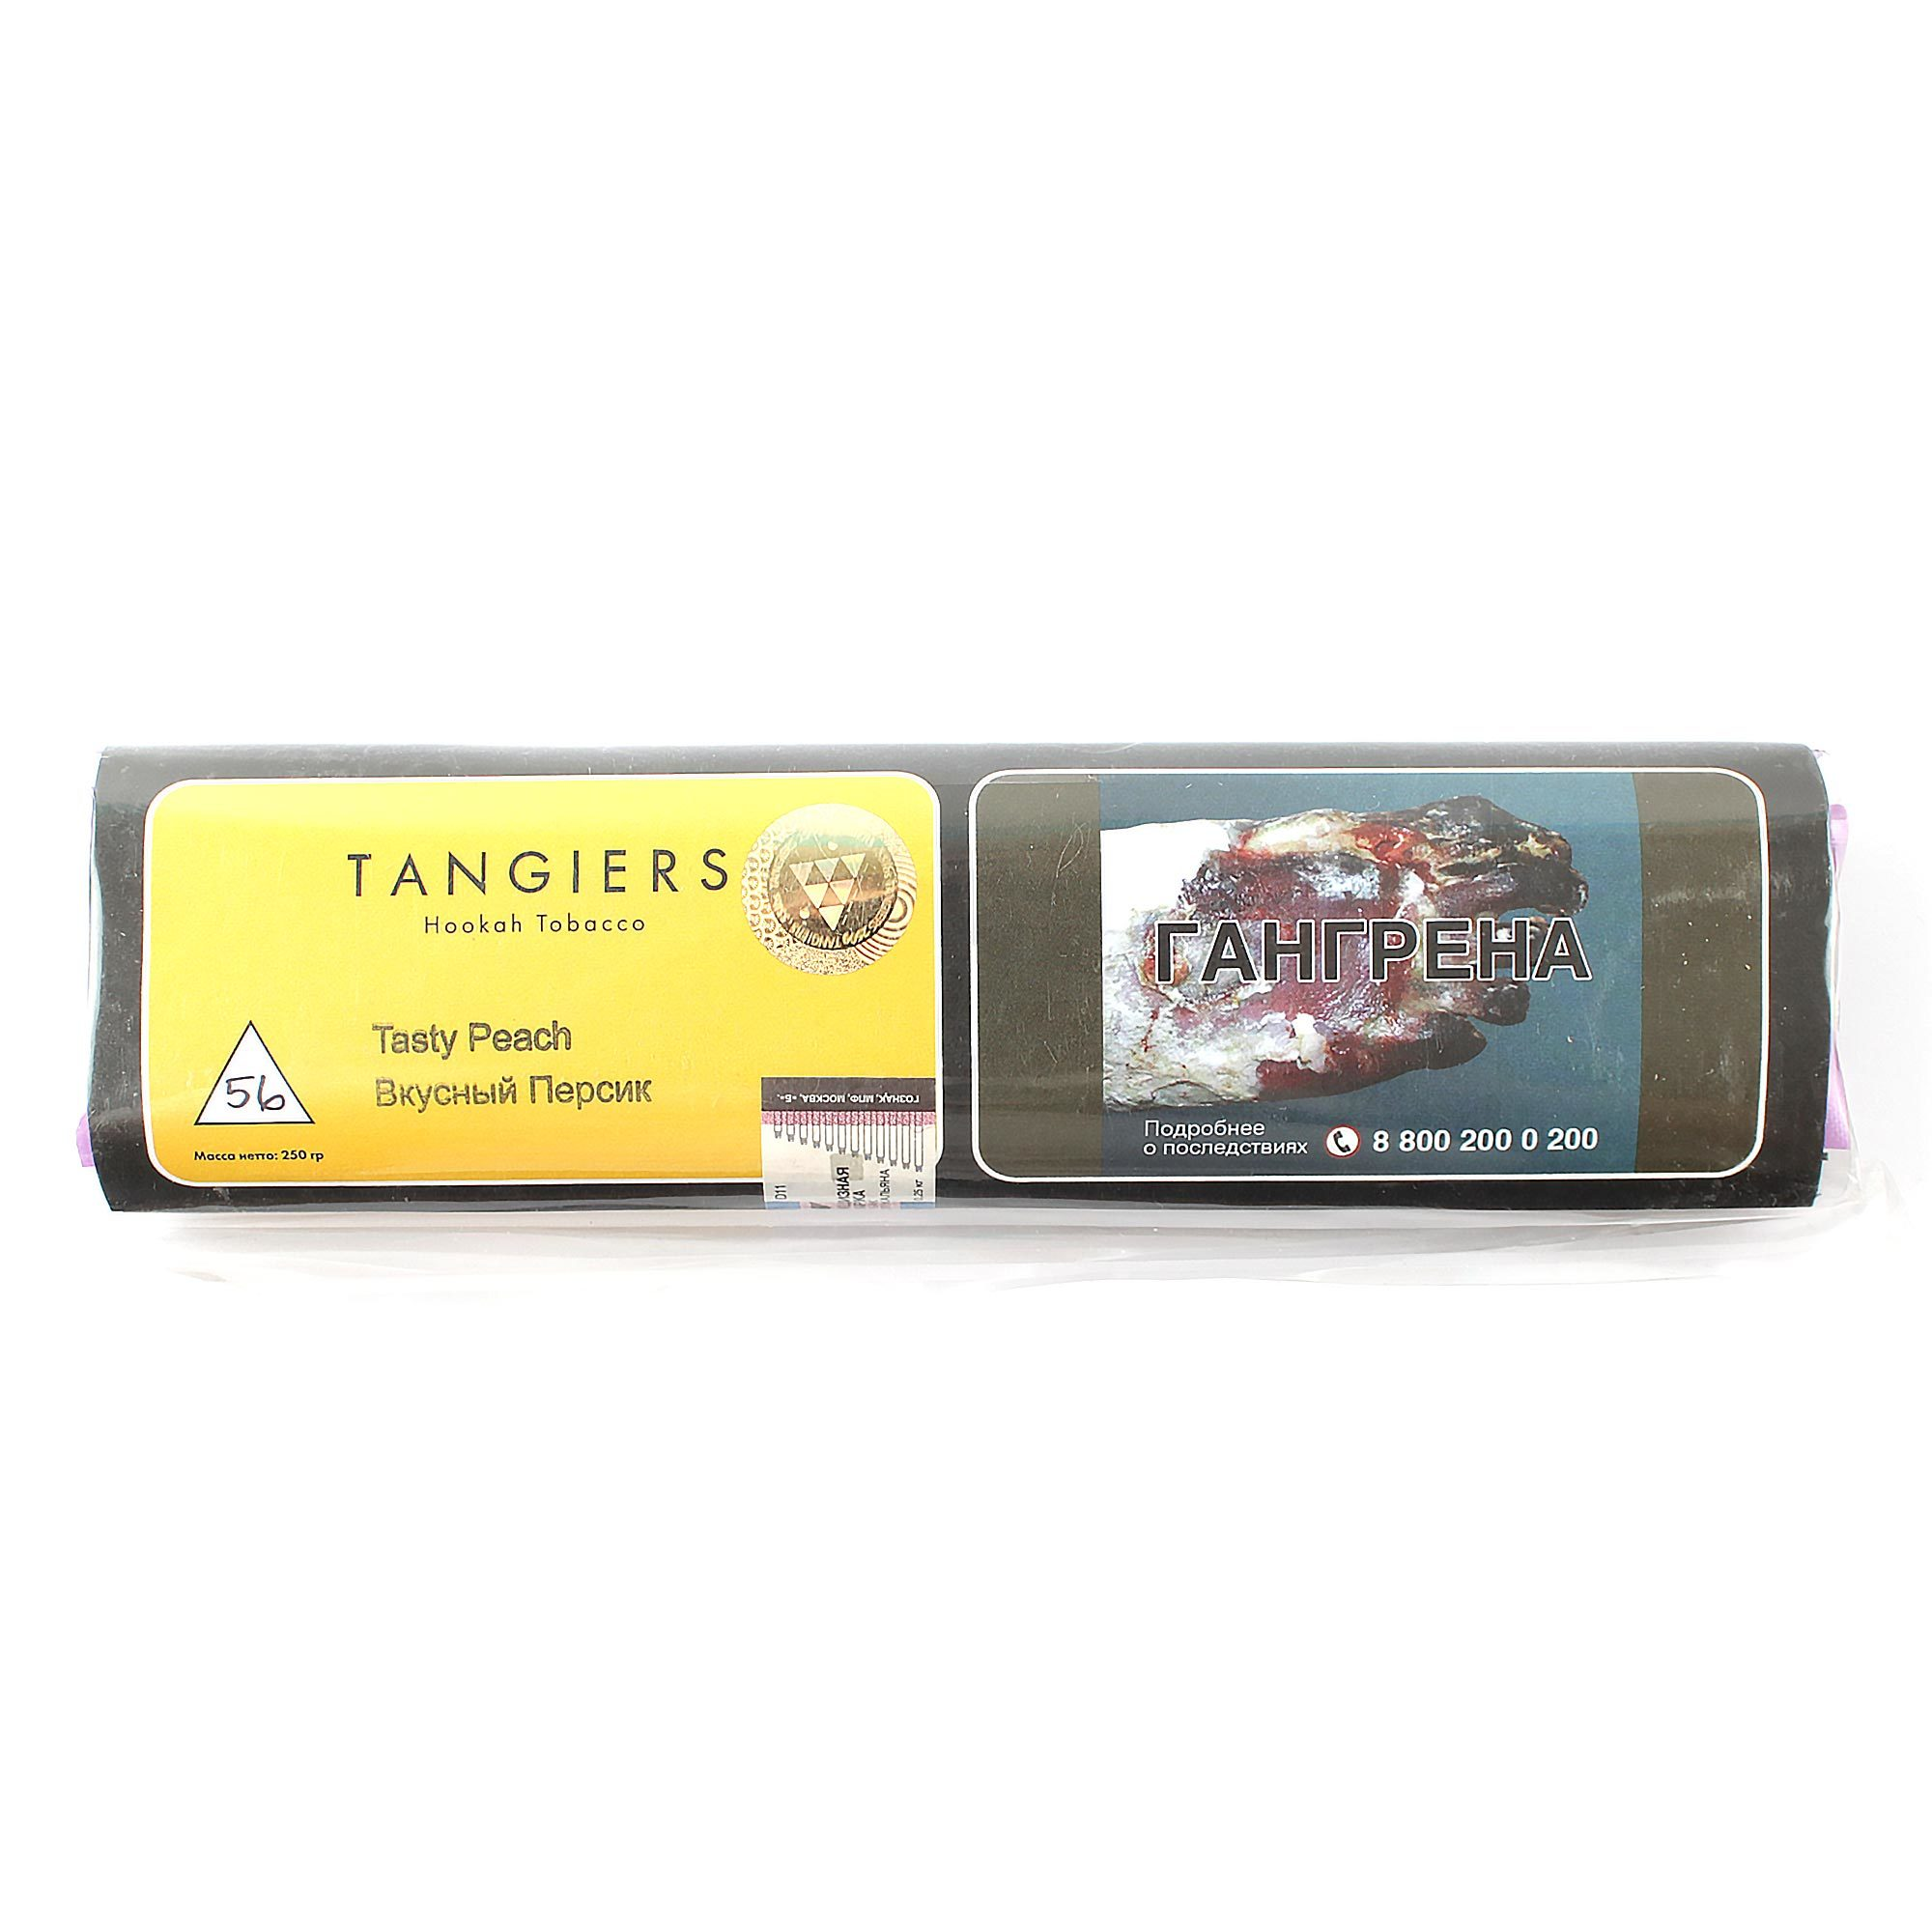 Табак для кальяна Tangiers Noir (желтый) 56 Tasty Peach